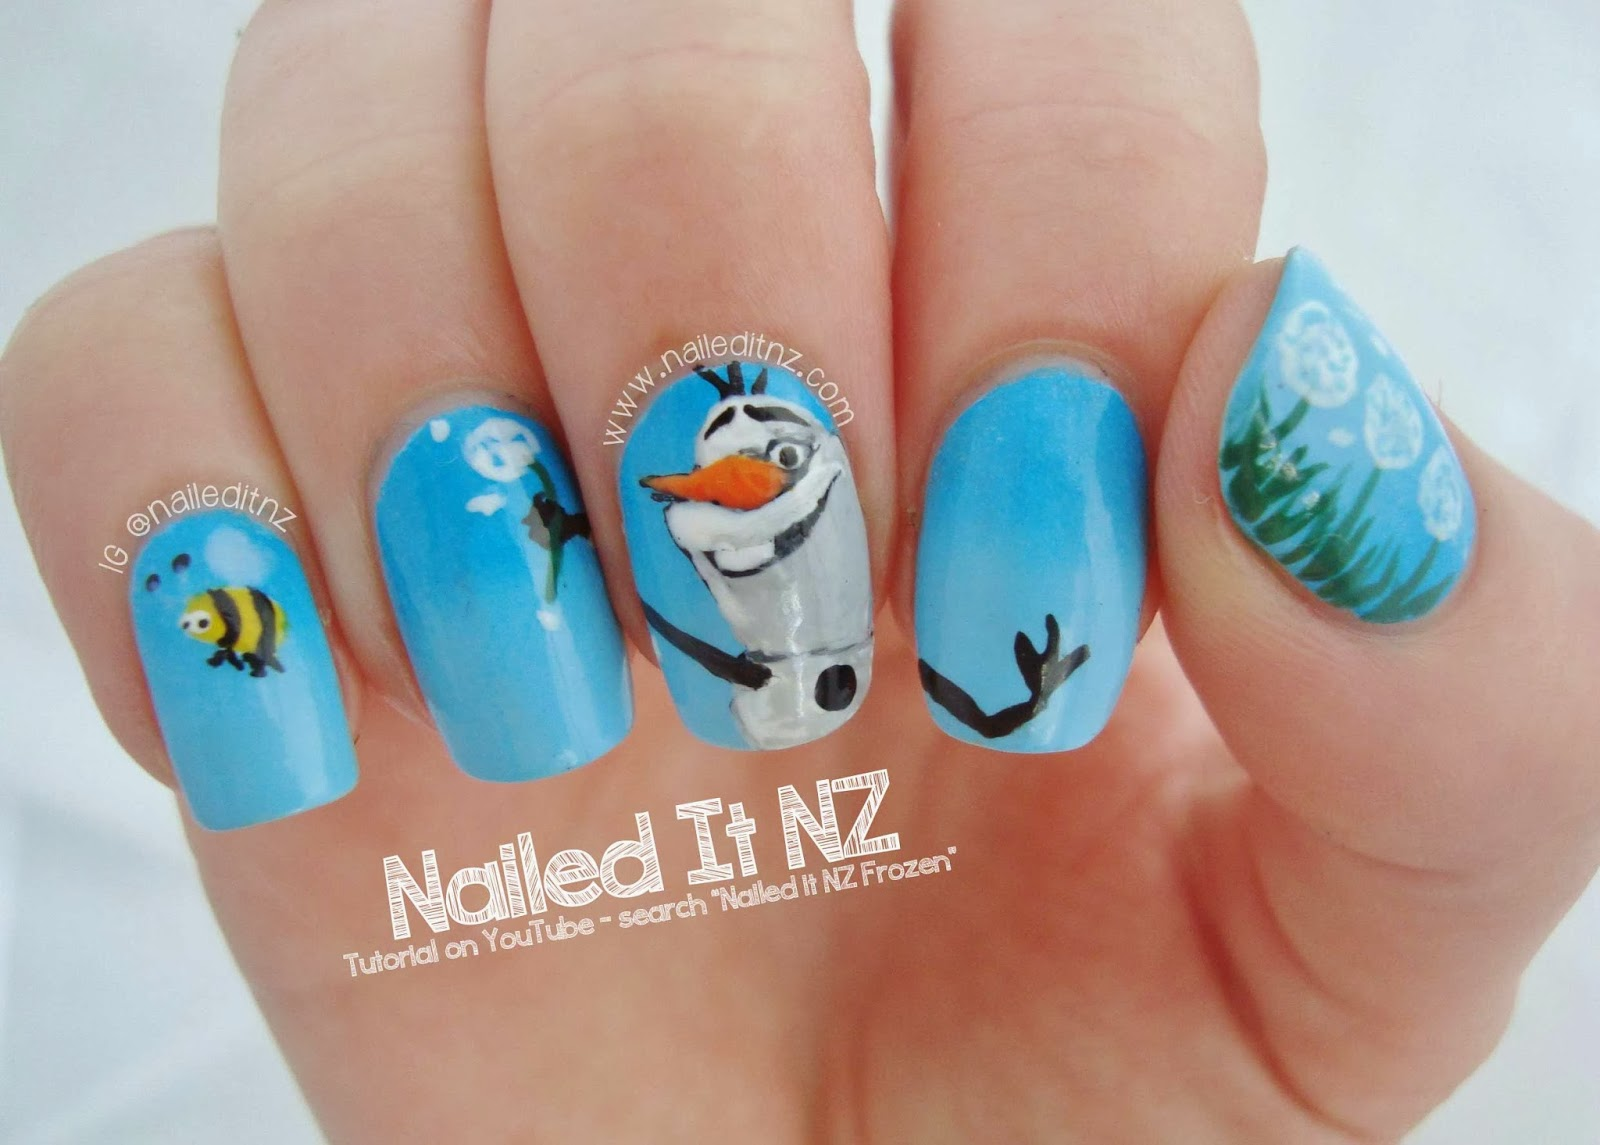 disney nail art 5 frozen little girl nail design ideas - Little Girl Nail Design Ideas